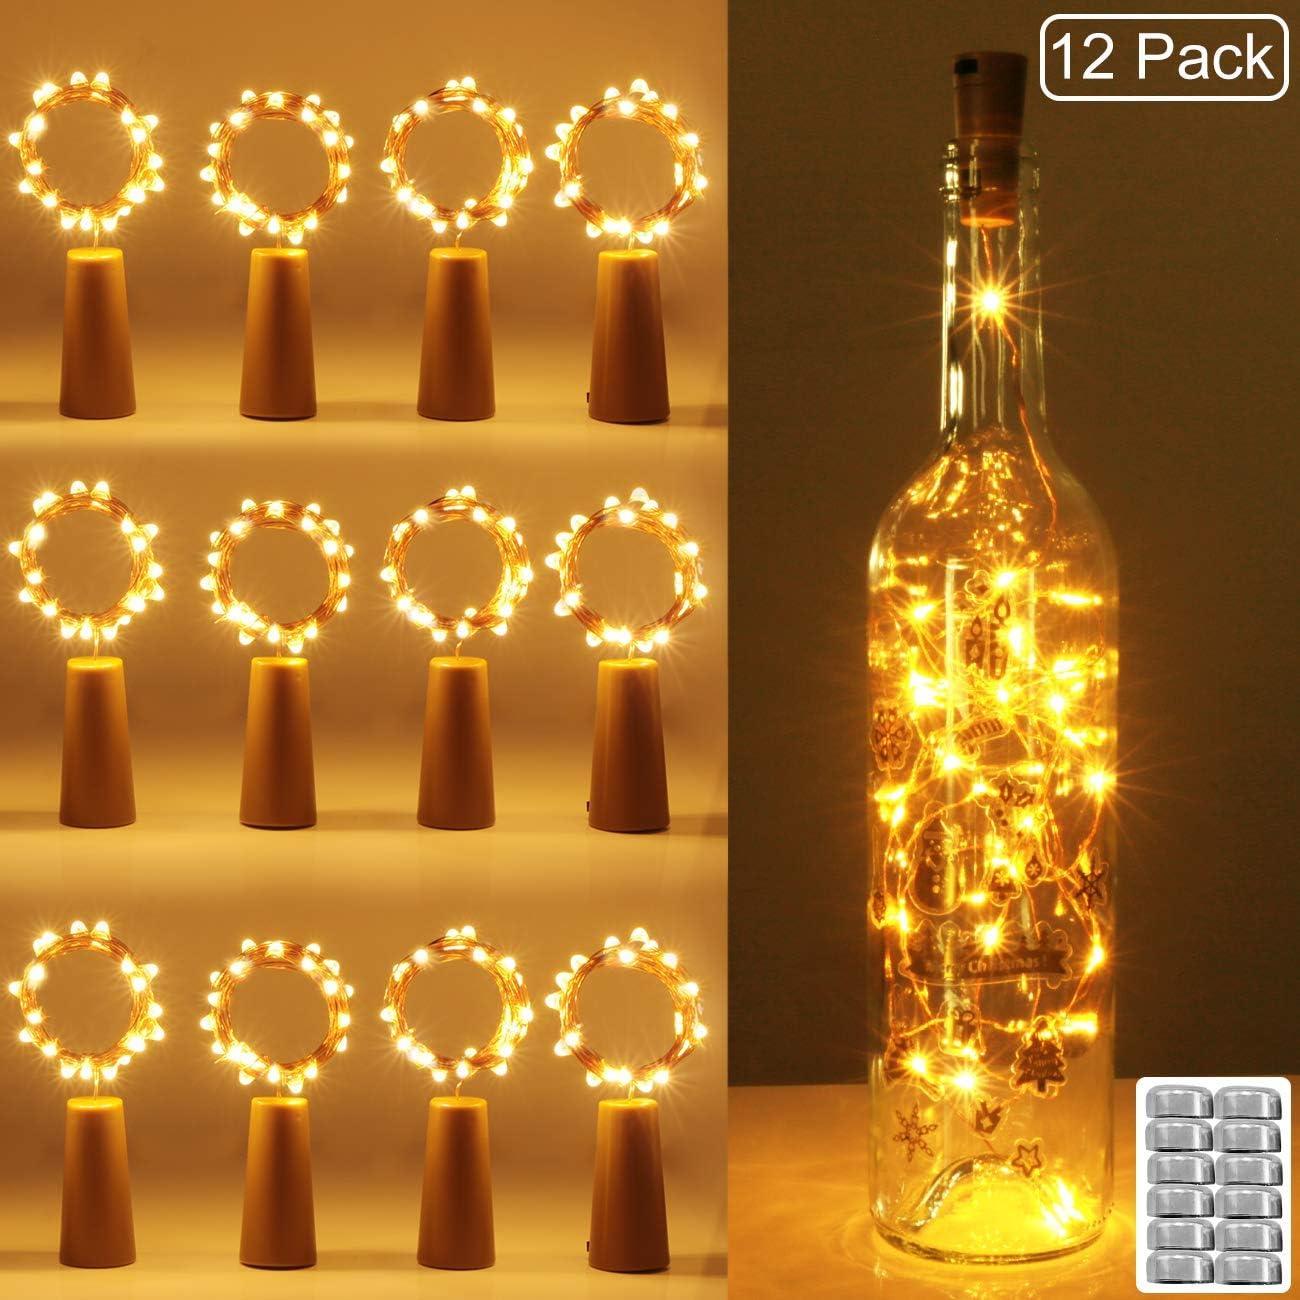 luz de Botella, Kolpop luz Corcho, luces led para Botellas de Vino ...